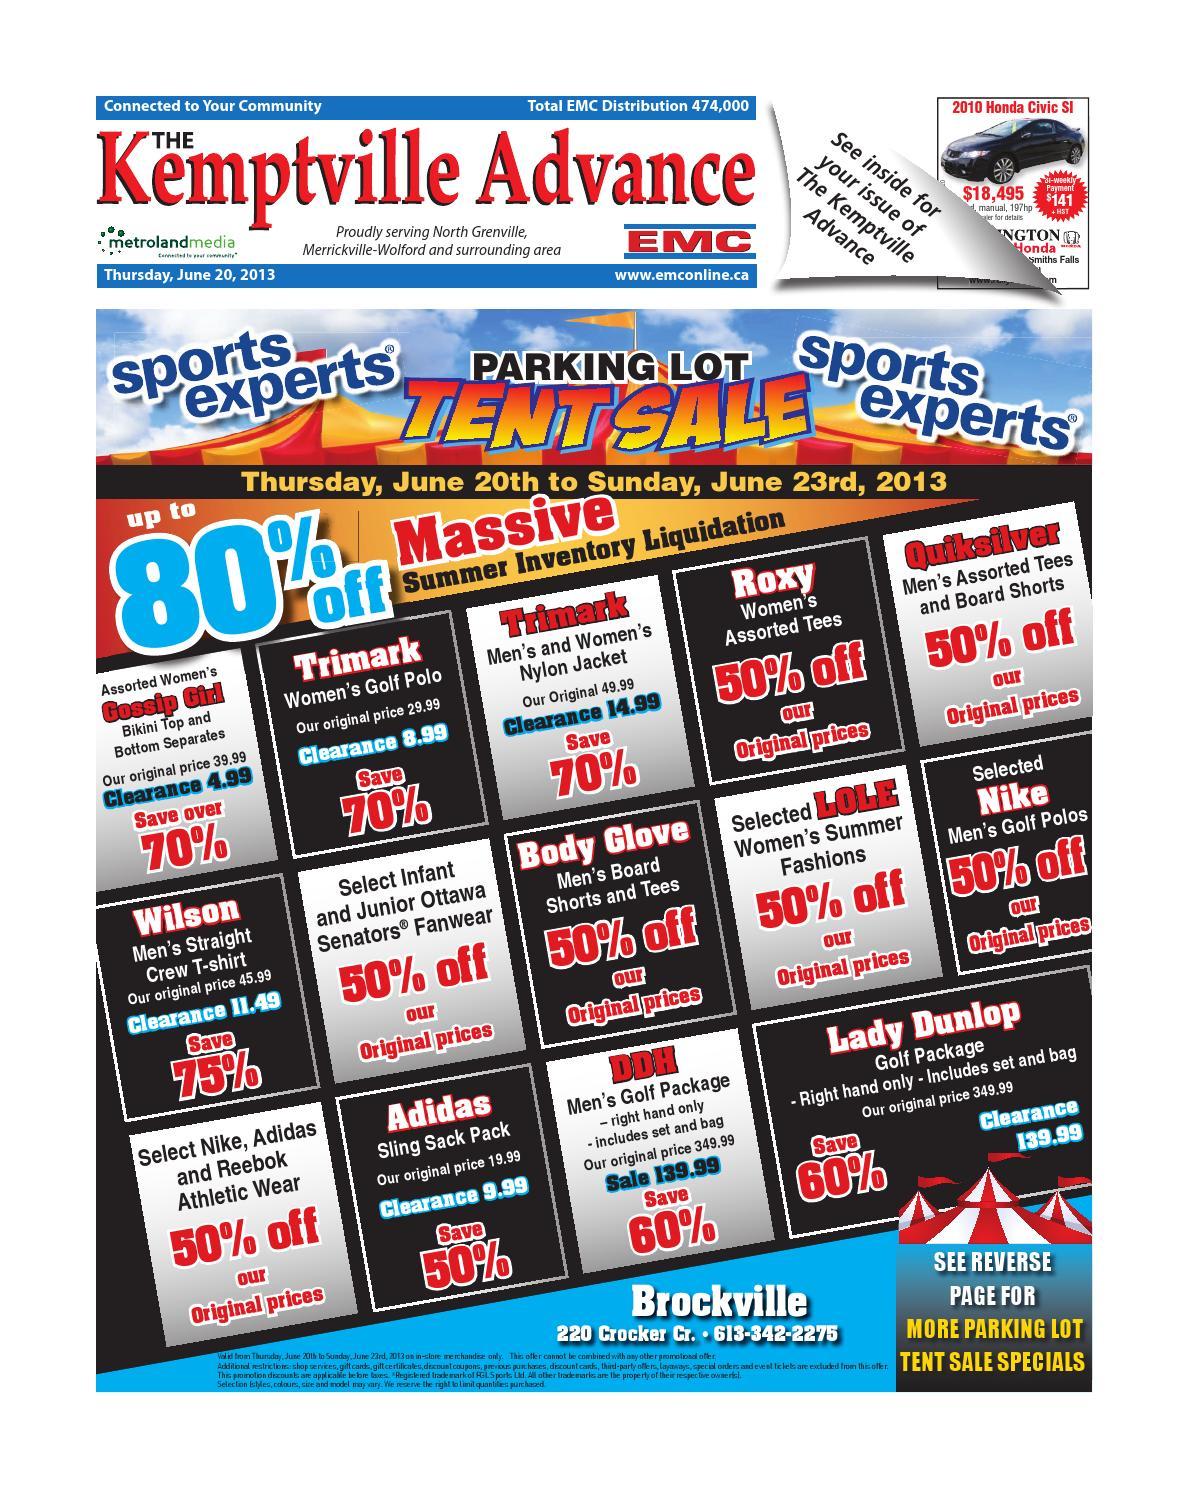 Kemptville062013 by Metroland East - Kemptville Advance - issuu cf829675587d6